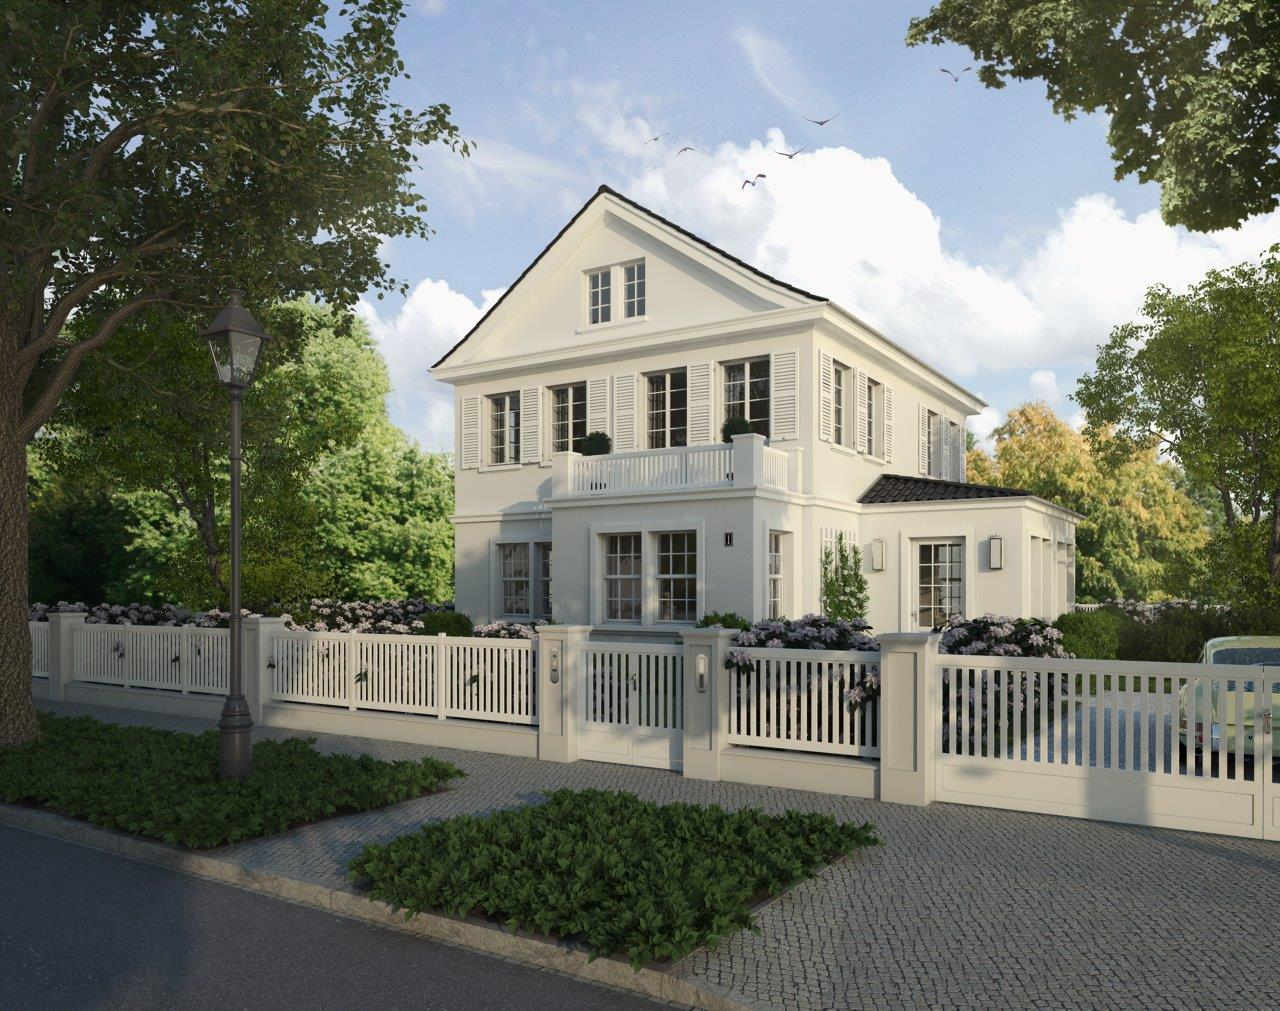 villa amalia dornow baukunst. Black Bedroom Furniture Sets. Home Design Ideas